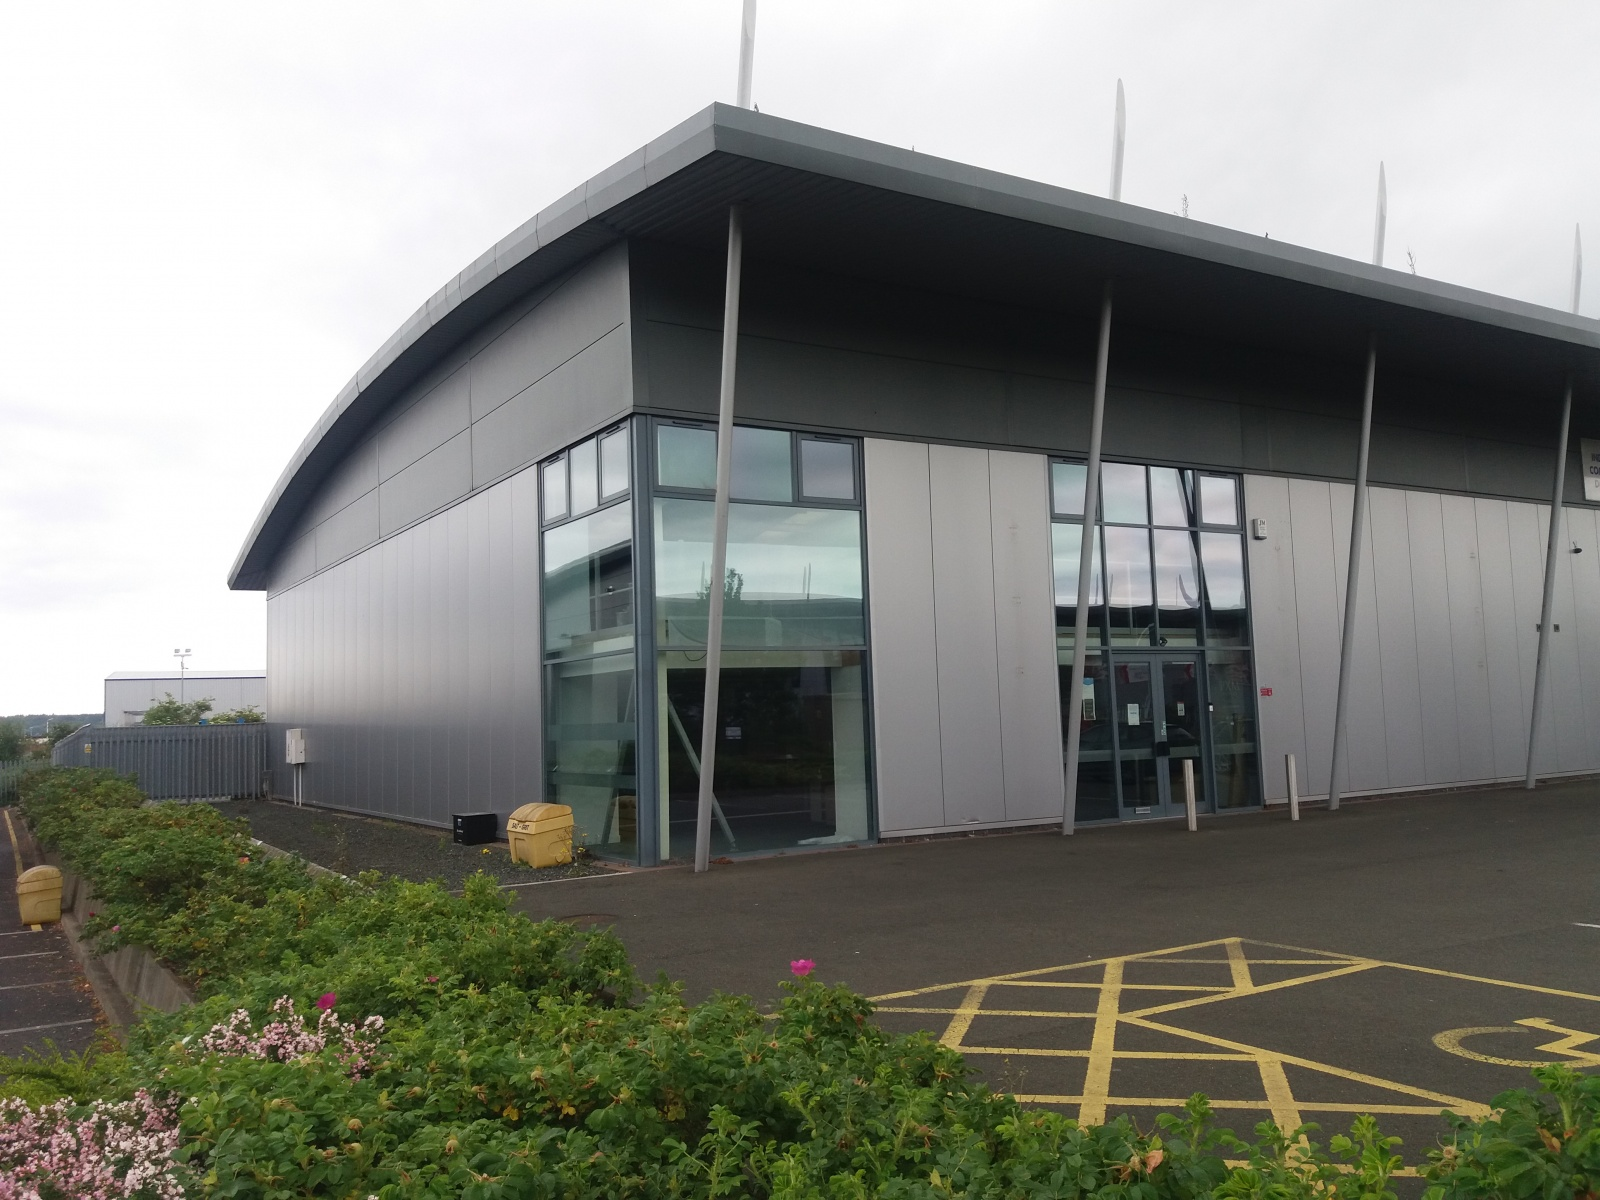 Unit F, Plot 15 Vanguard Way, Battlefield Enterprise Park, Shrewsbury, Shropshire